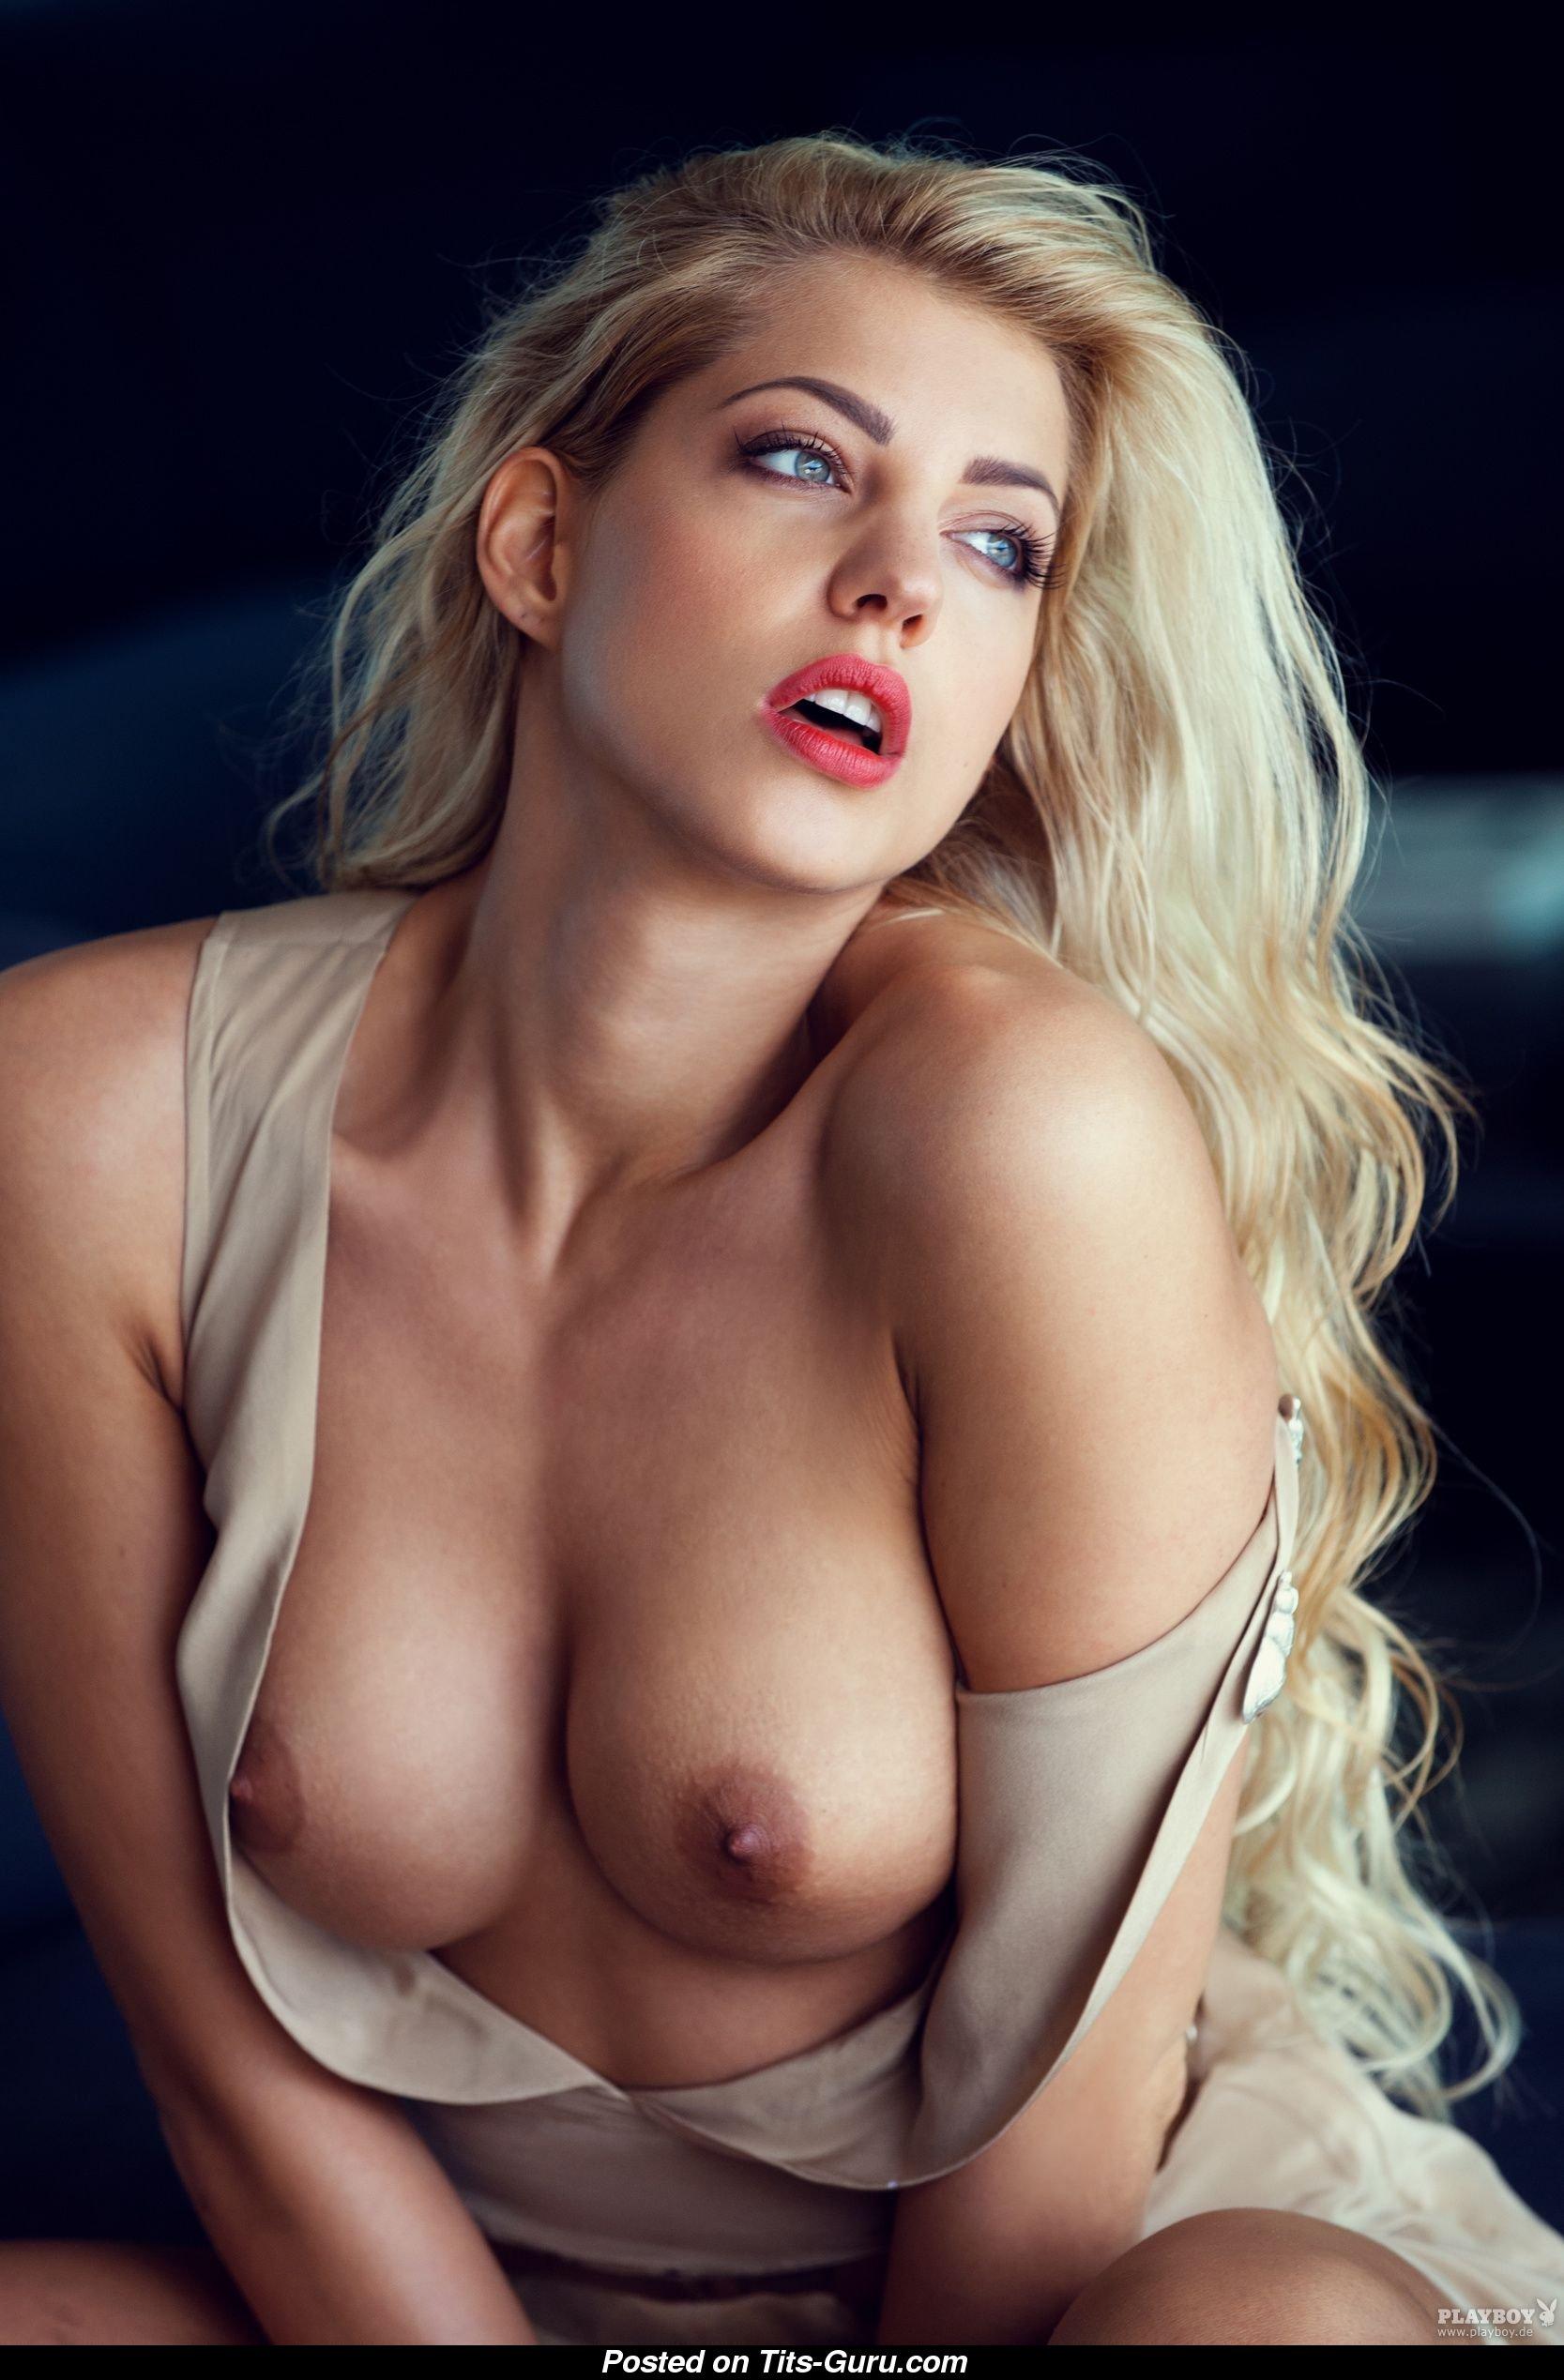 Pity, Sarah lancaster blonde nude opinion you